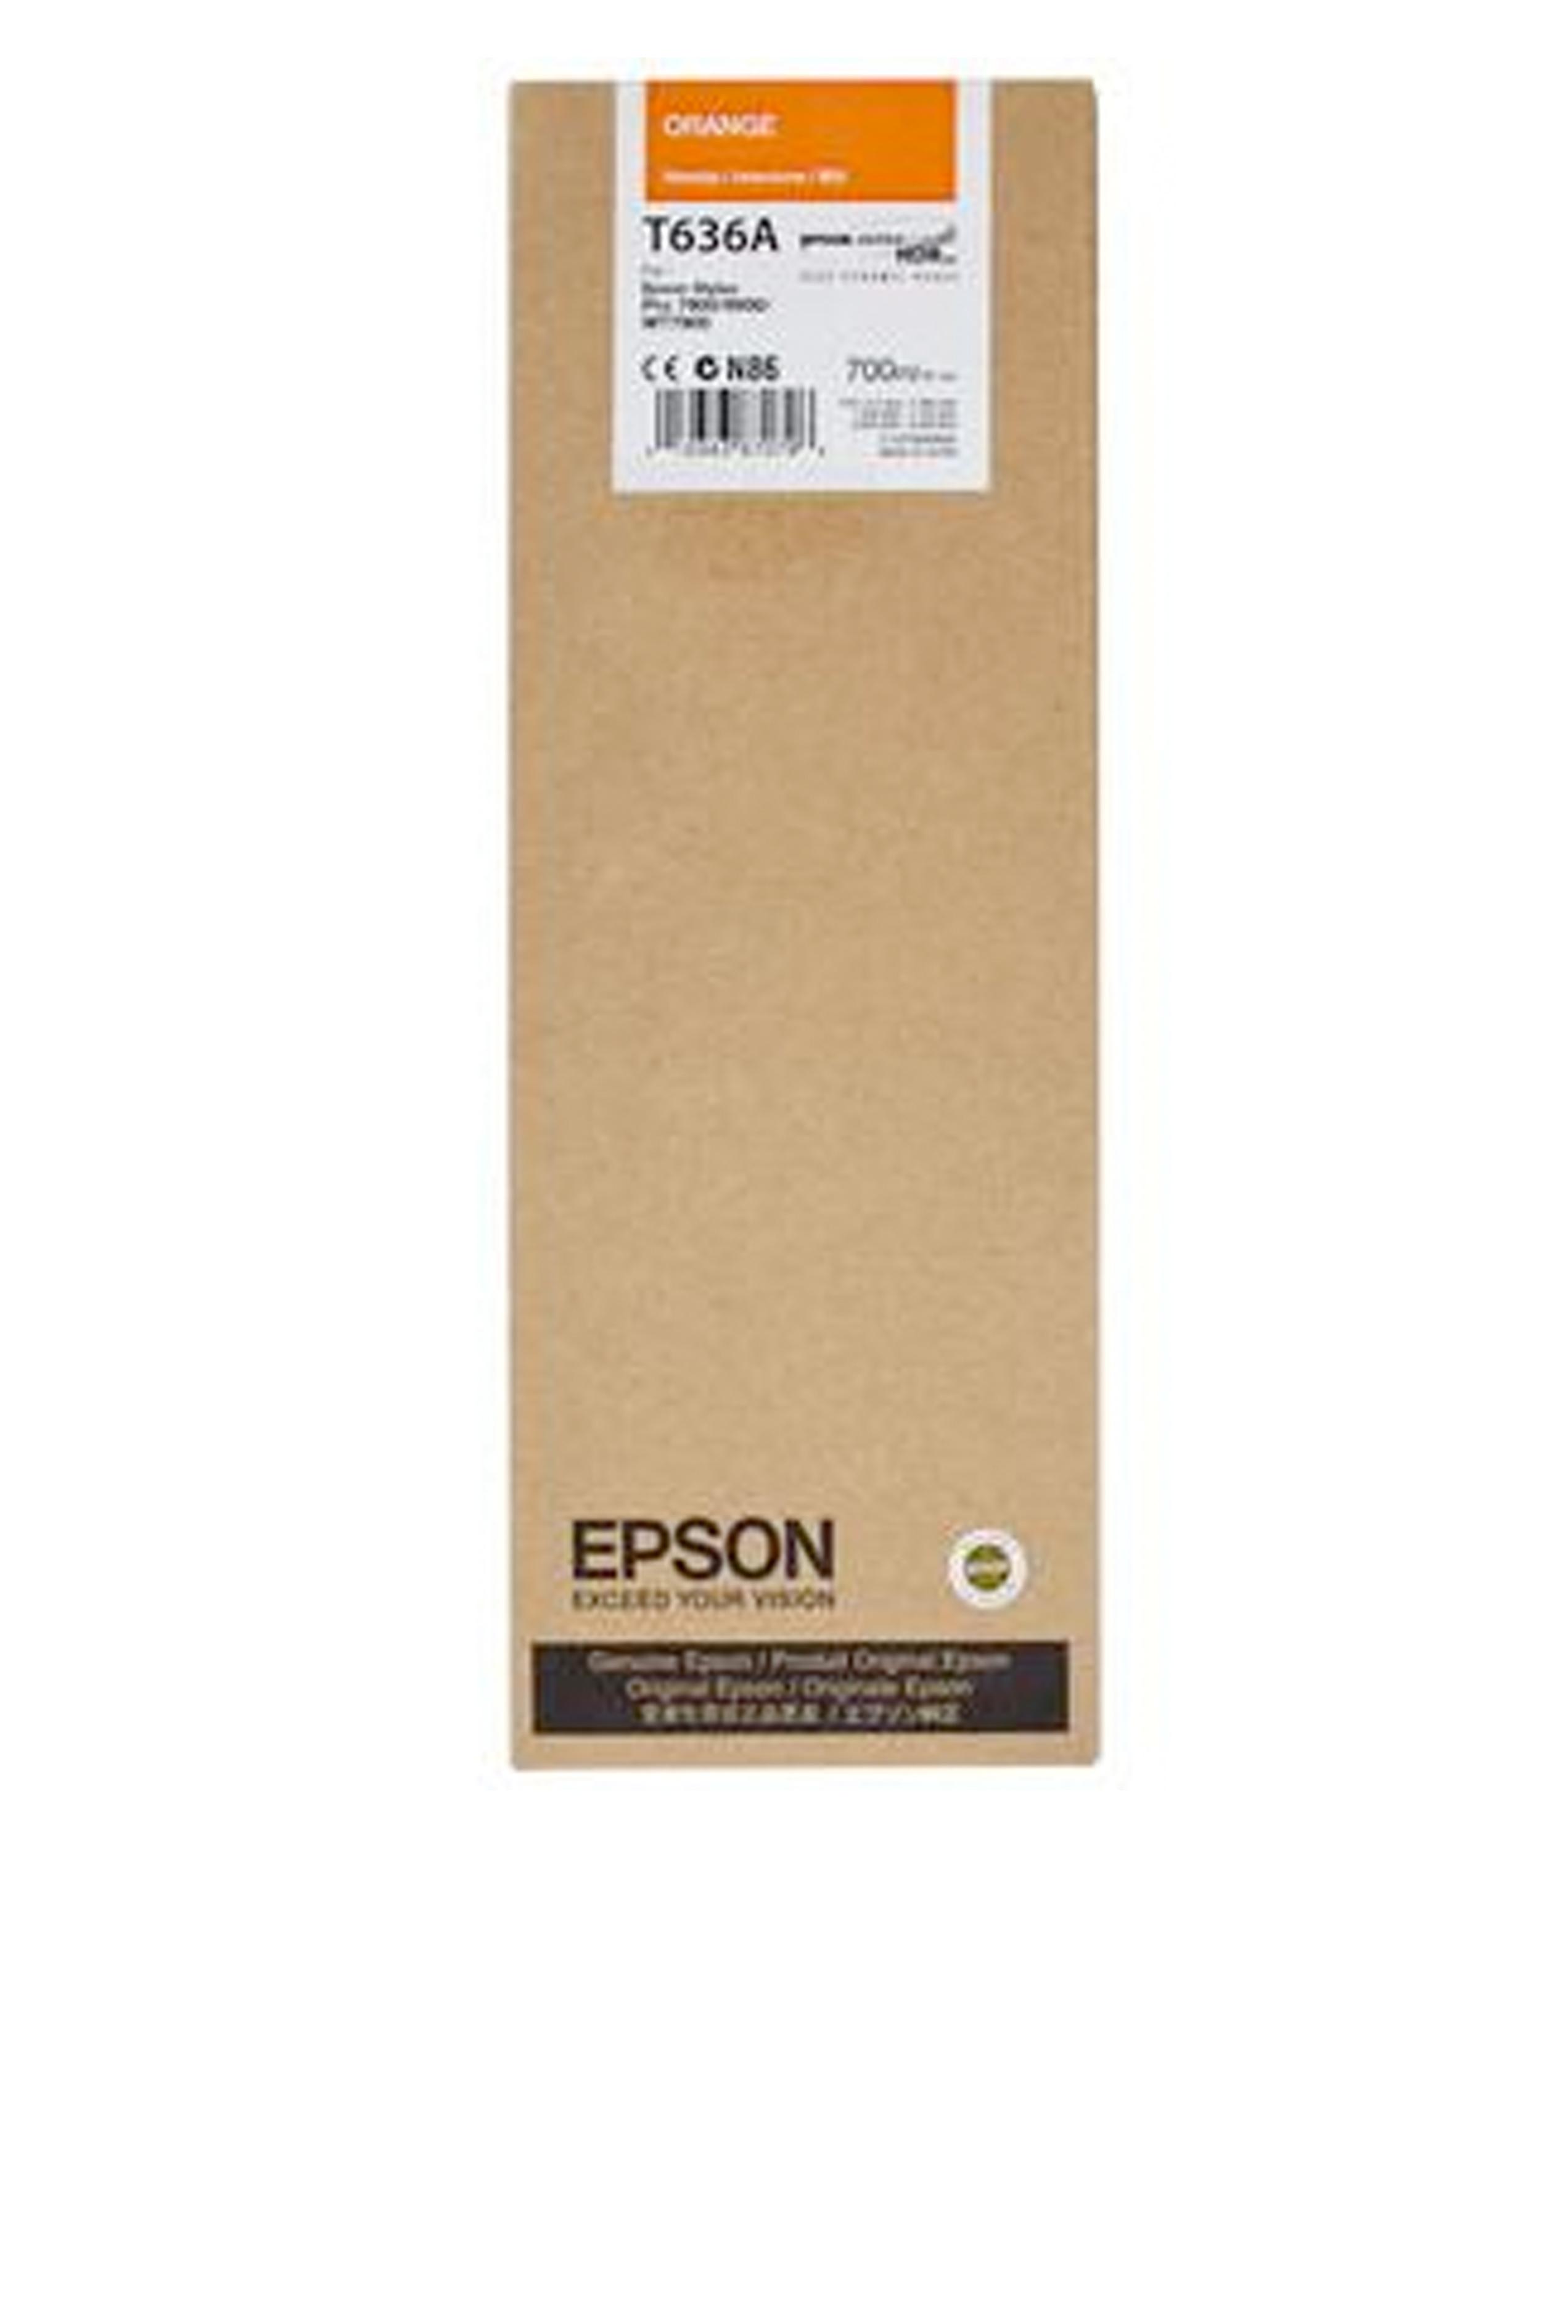 Epson EPSON HI ORANGE INK (700 ML) (T636A00)